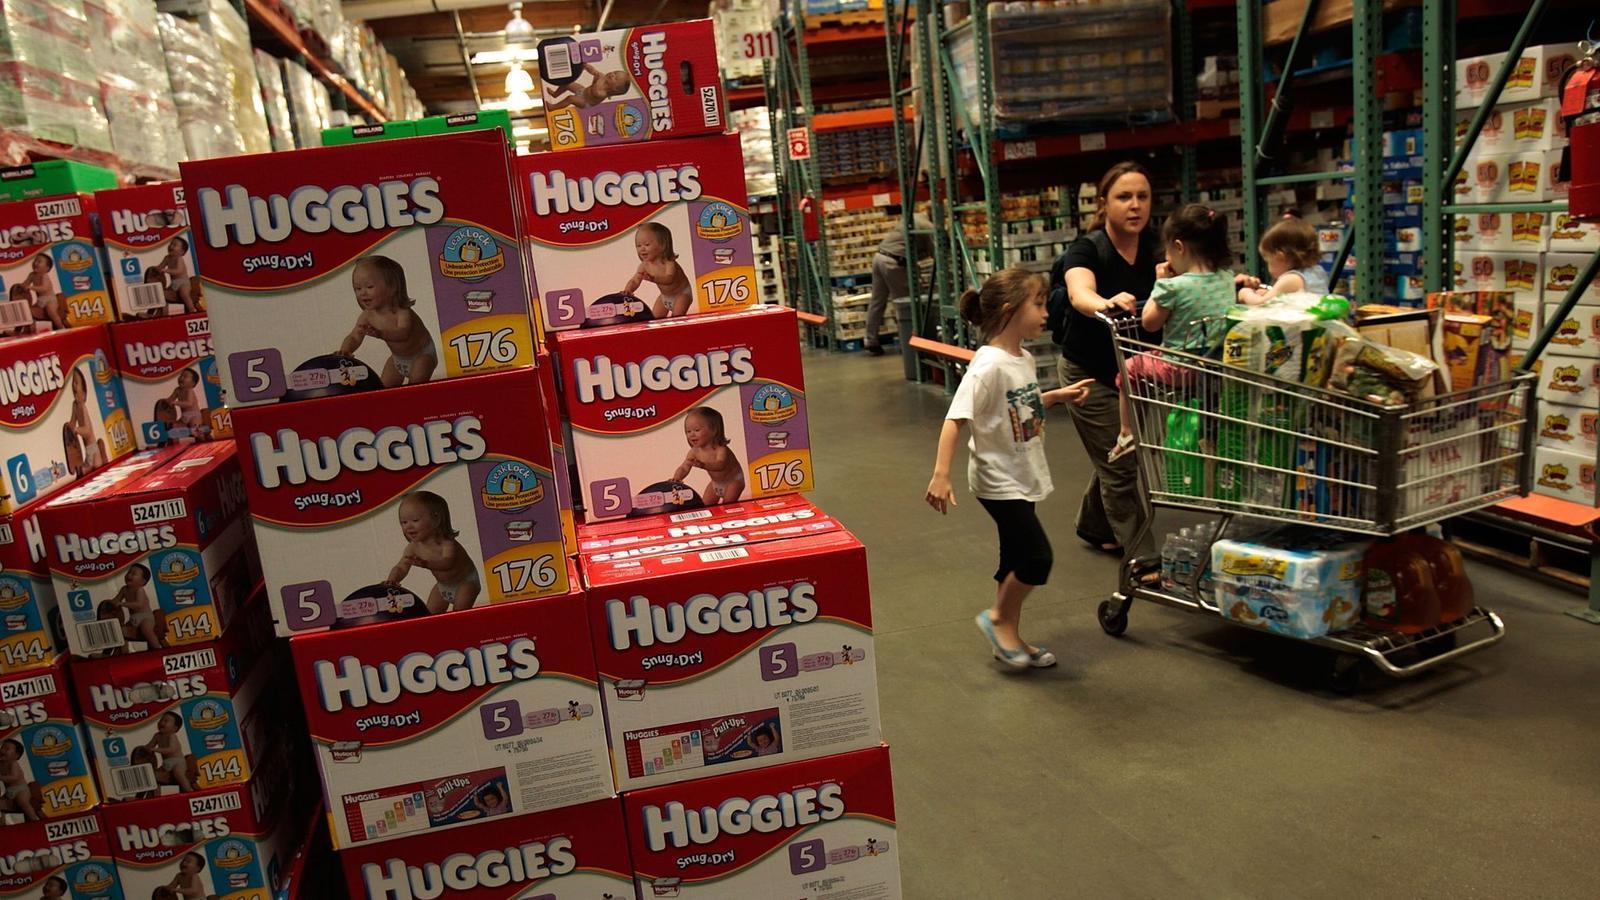 california start giving vouchers for diapers to families on california start giving vouchers for diapers to families on welfare la times